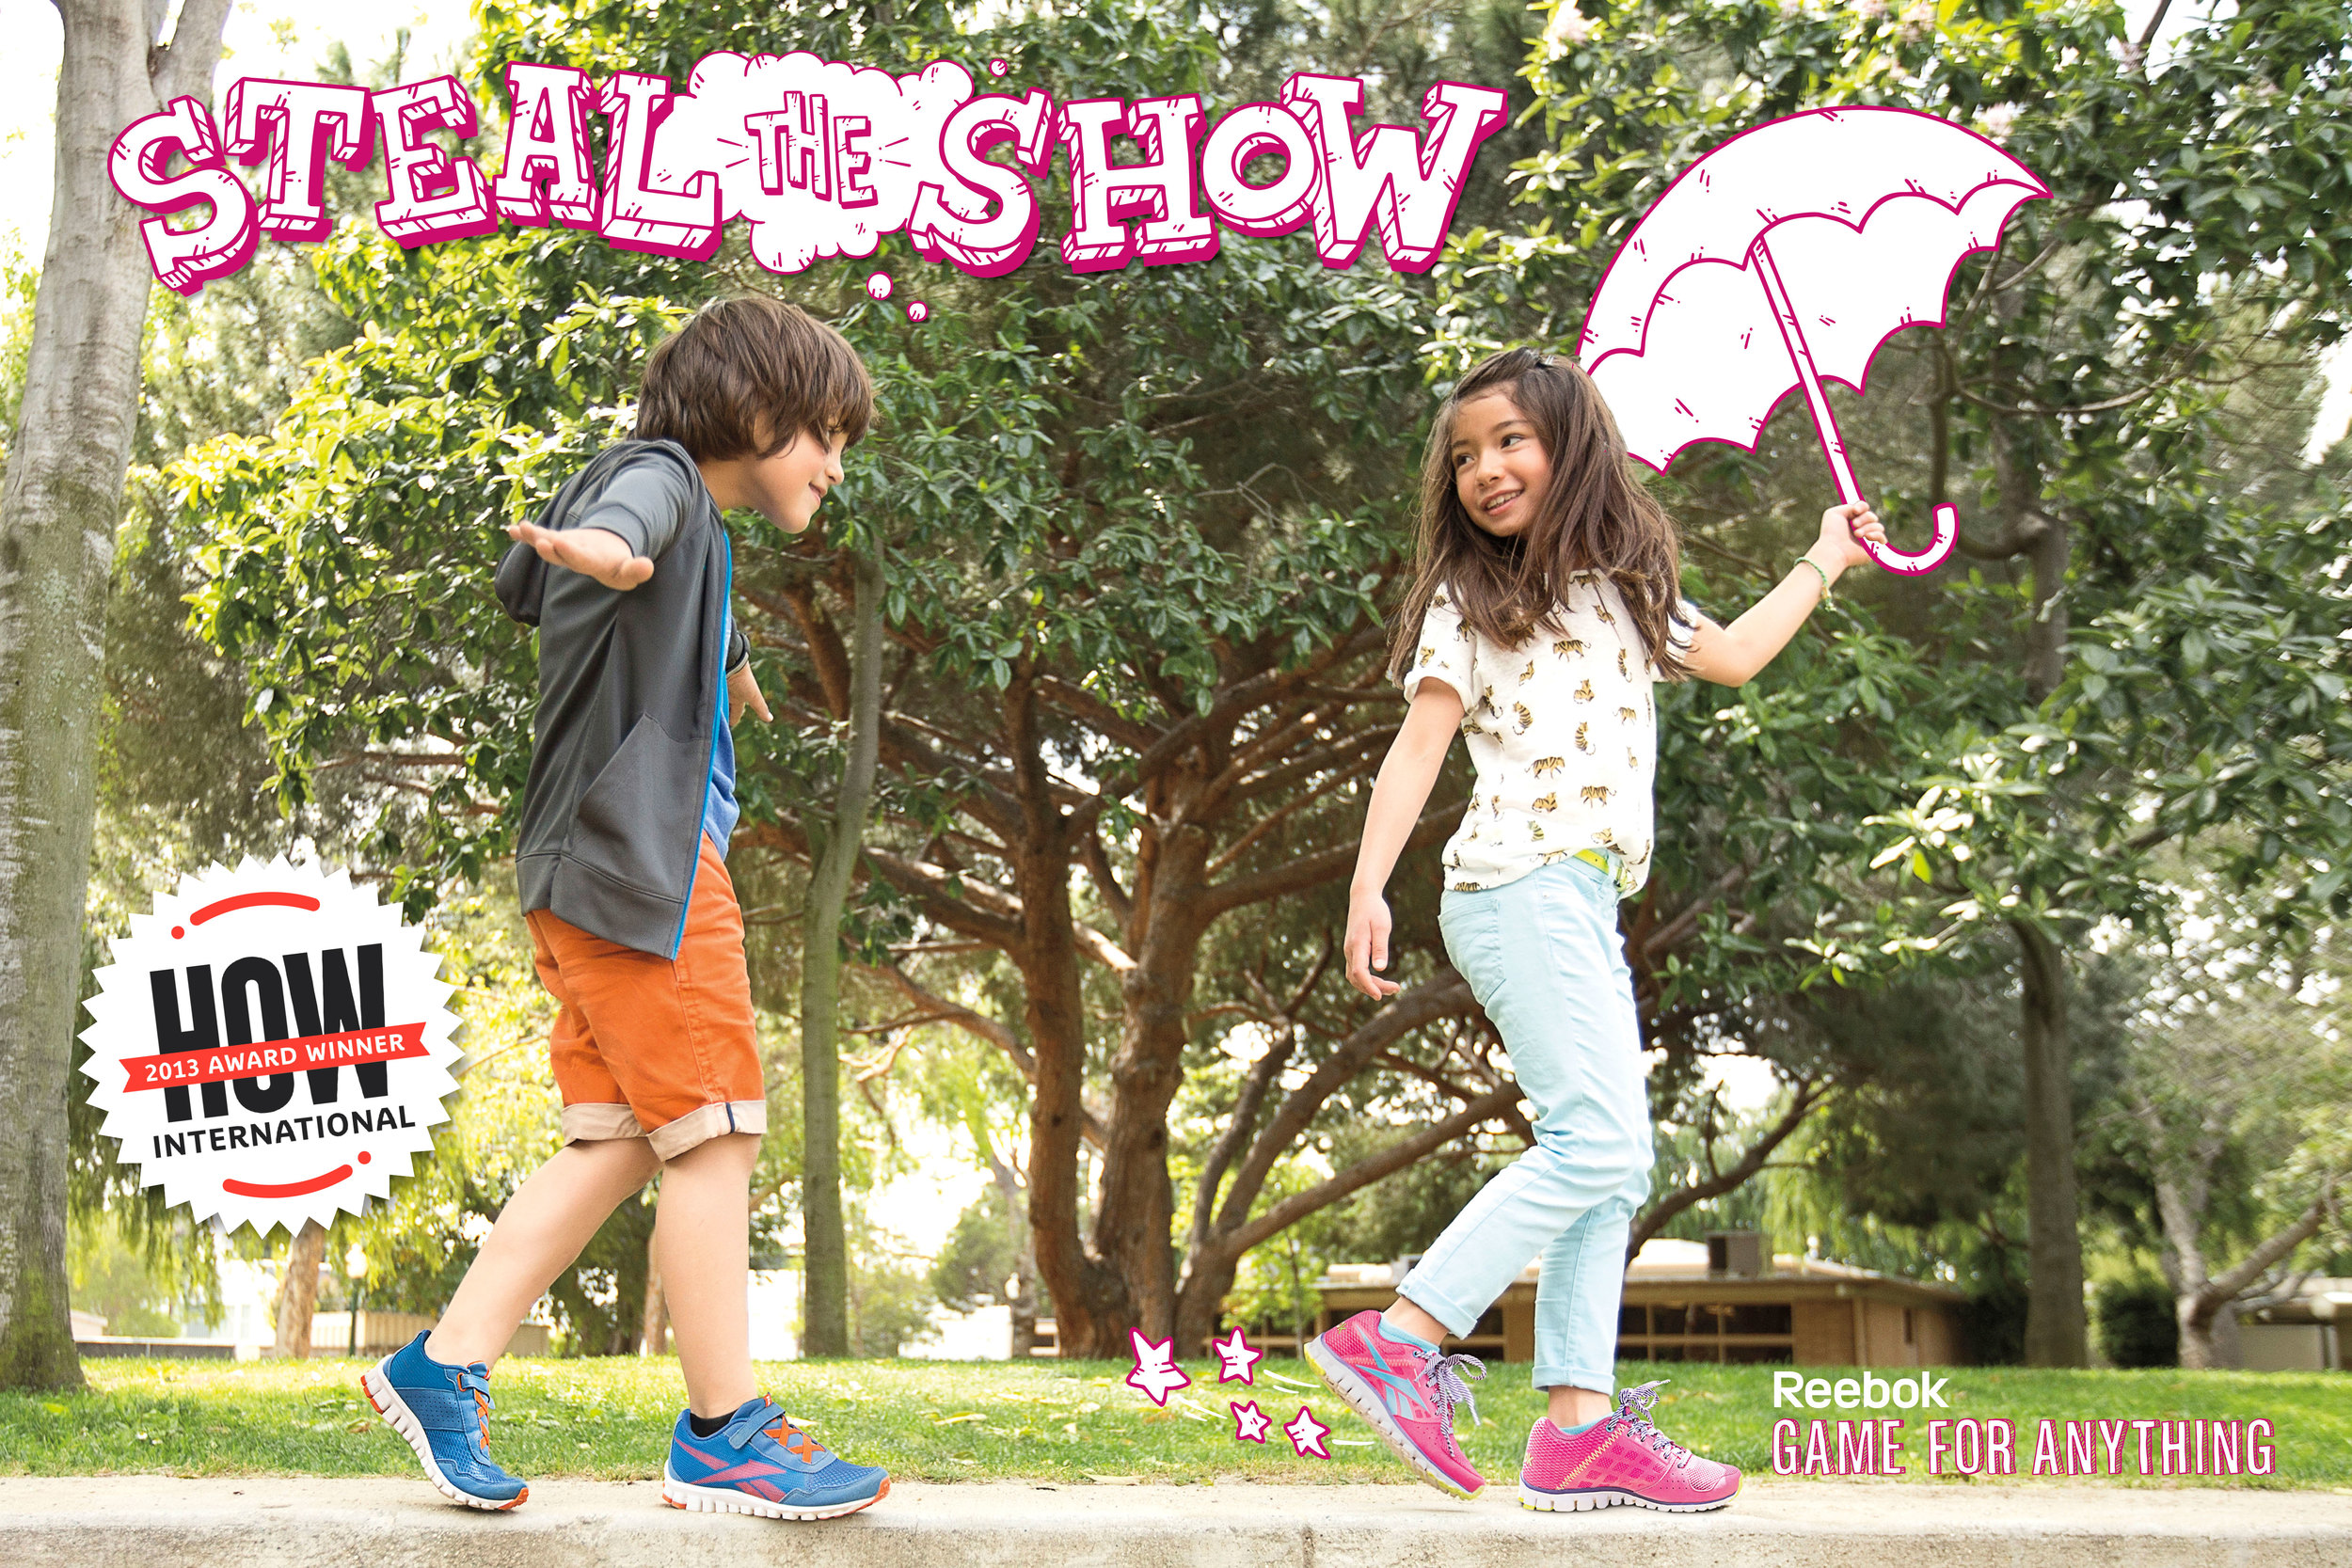 Steal-The-Show_Hero-2-HORZ_alt.jpg